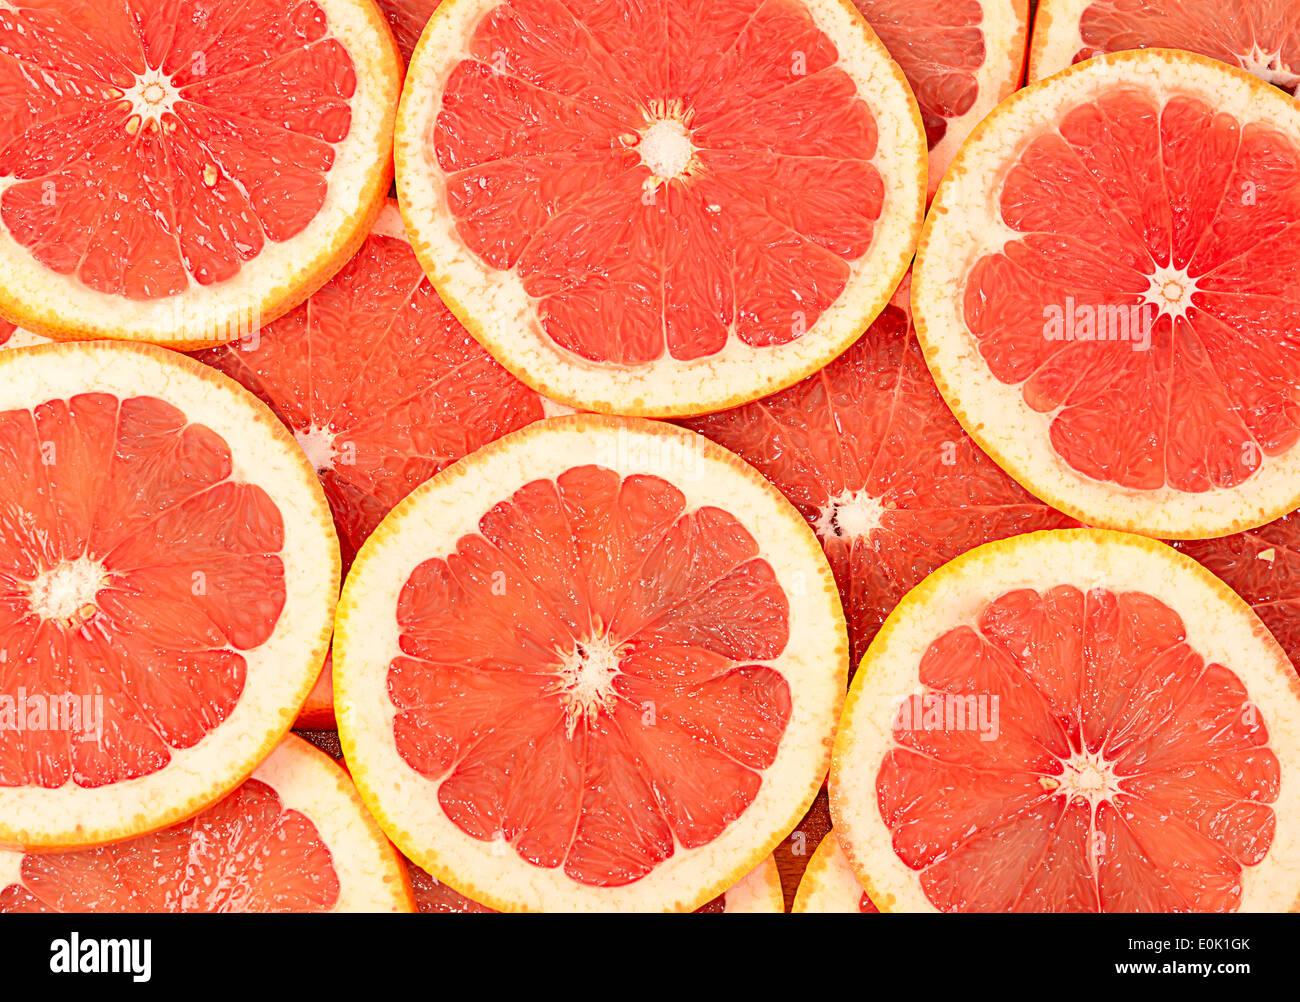 The fresh grapefruit as a background closeup - Stock Image